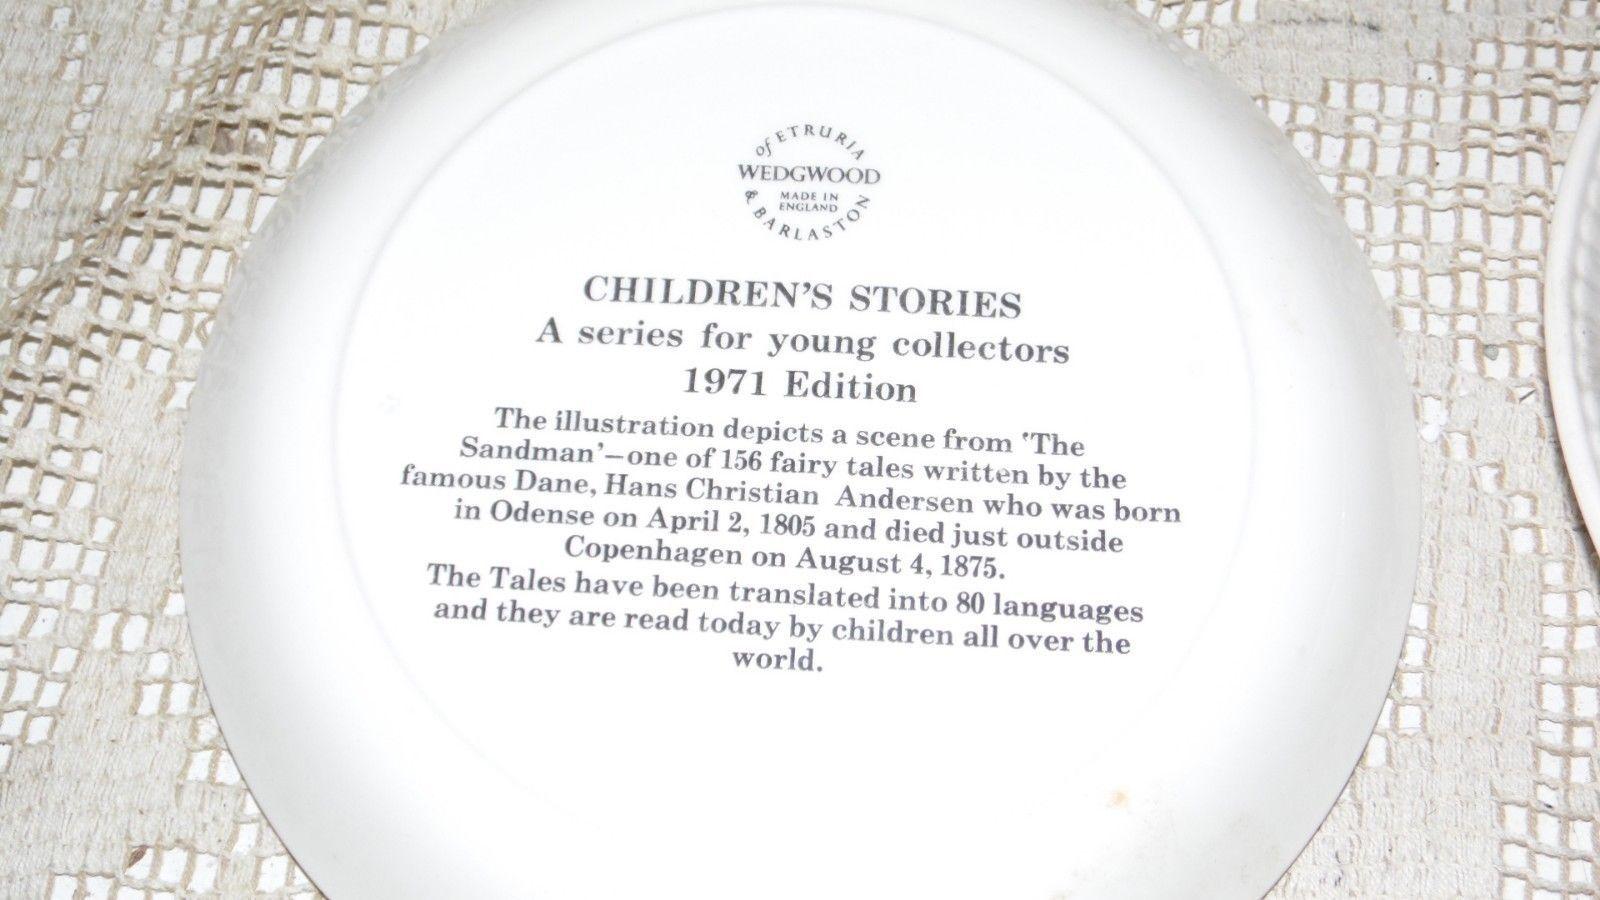 WEDGWOOD CHILDREN'S SANDMAN/TINDERBOX 1971-72 HANS CHRISTIAN ANDERSON PLATES SET